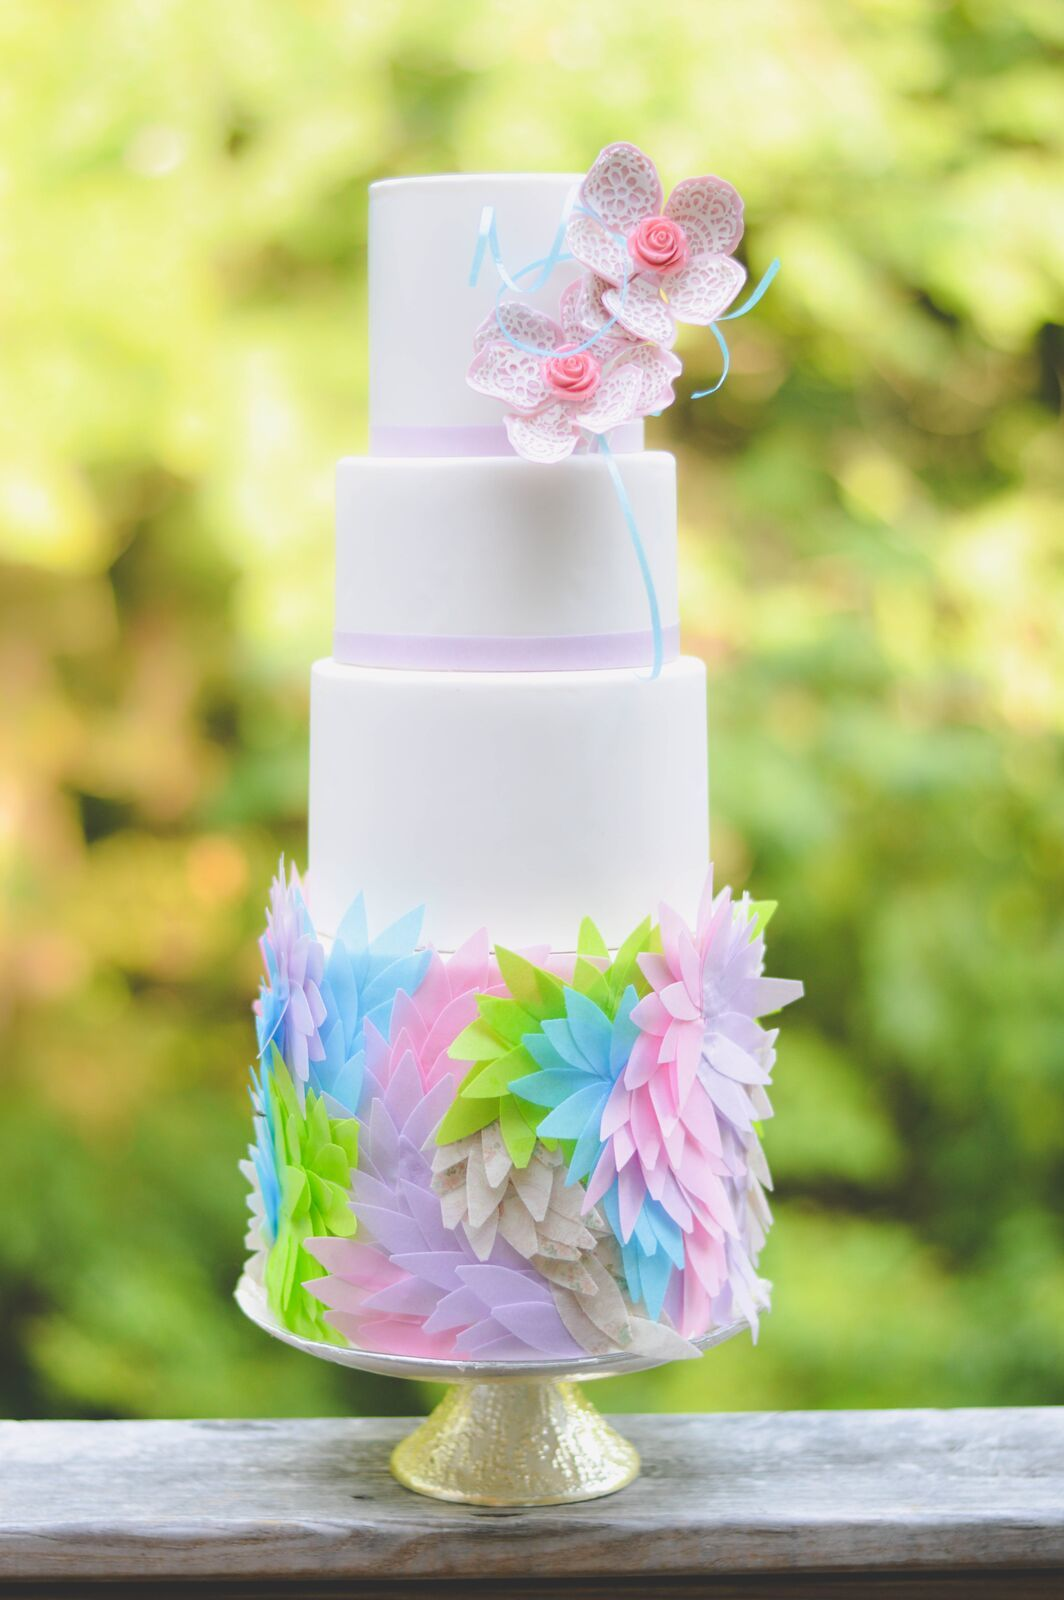 Brides-Around-the-World-Rebekah-Wilbur.jpeg#asset:13761